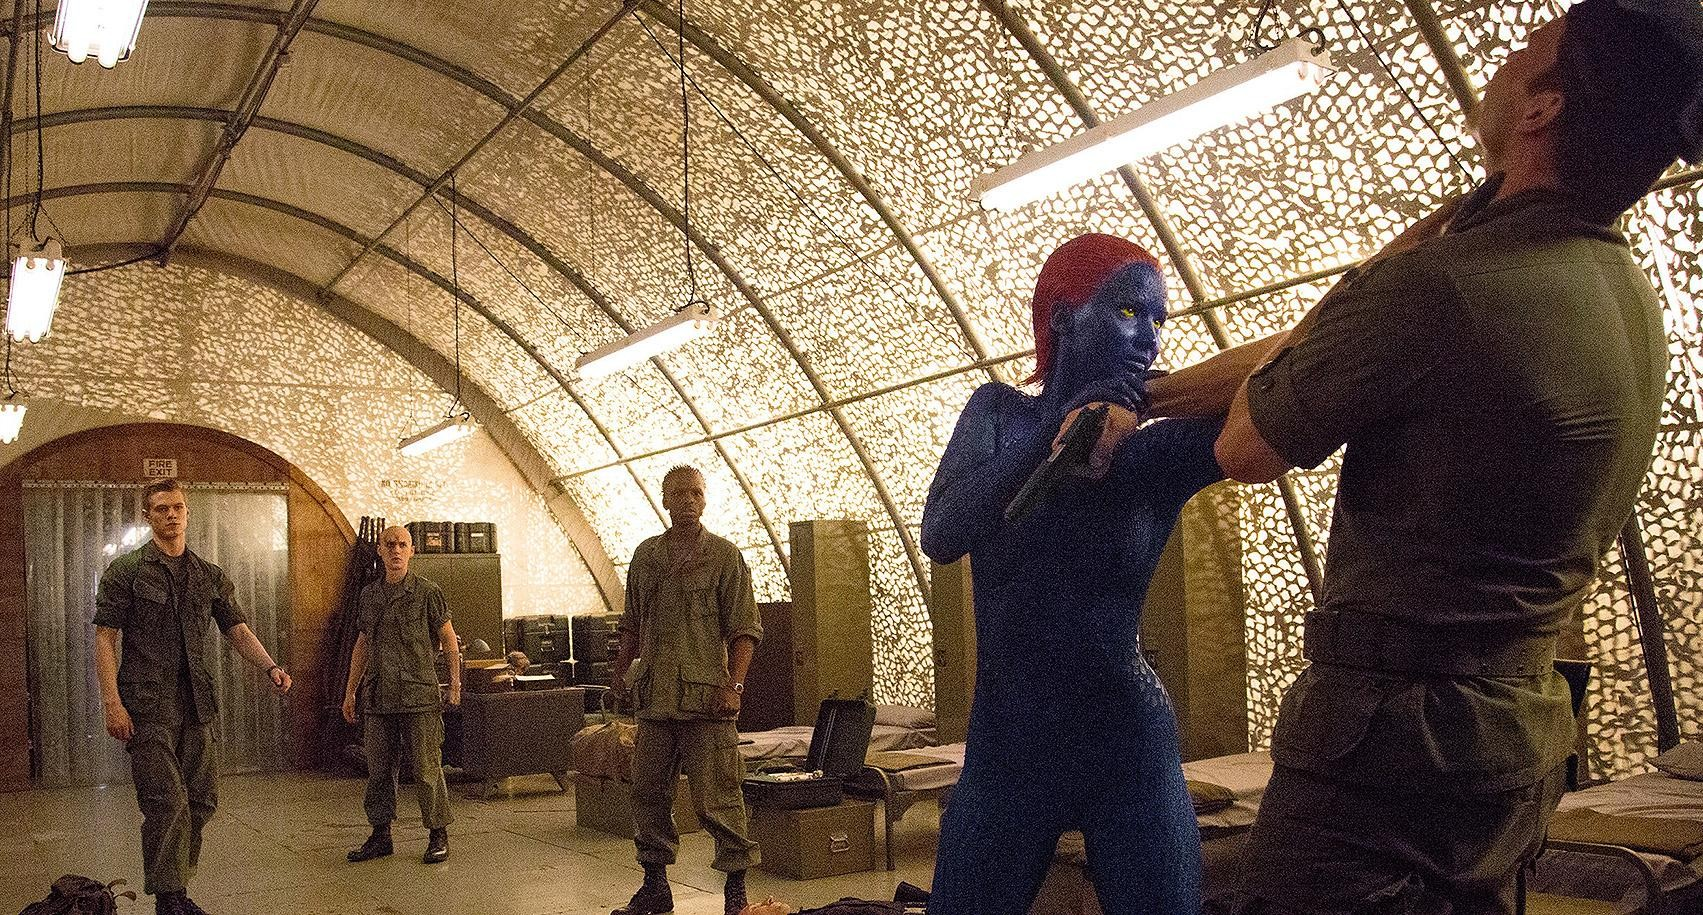 'X-Men' Franchise Hits $3 Billion in Global Ticket Sales